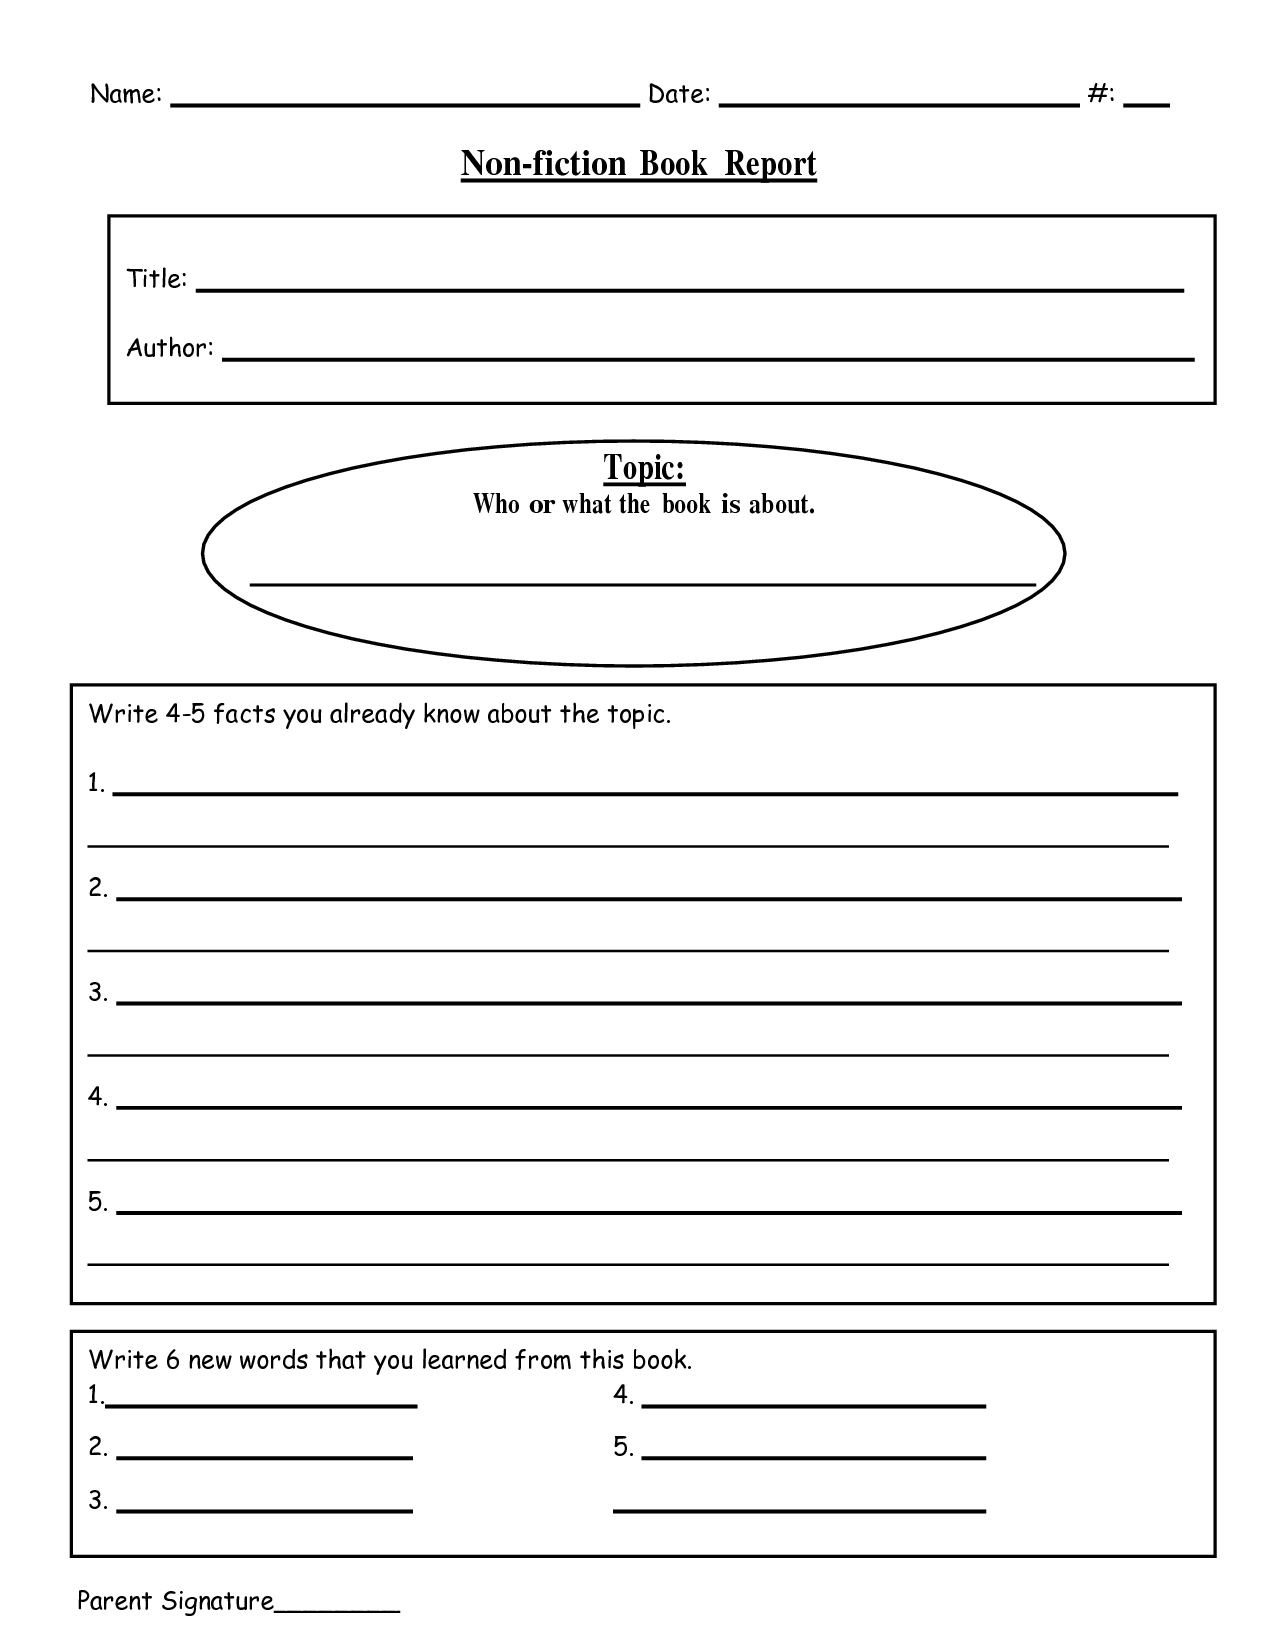 Free Printable Book Report Templates   Non-Fiction Book Report.doc - Free Printable Book Report Forms